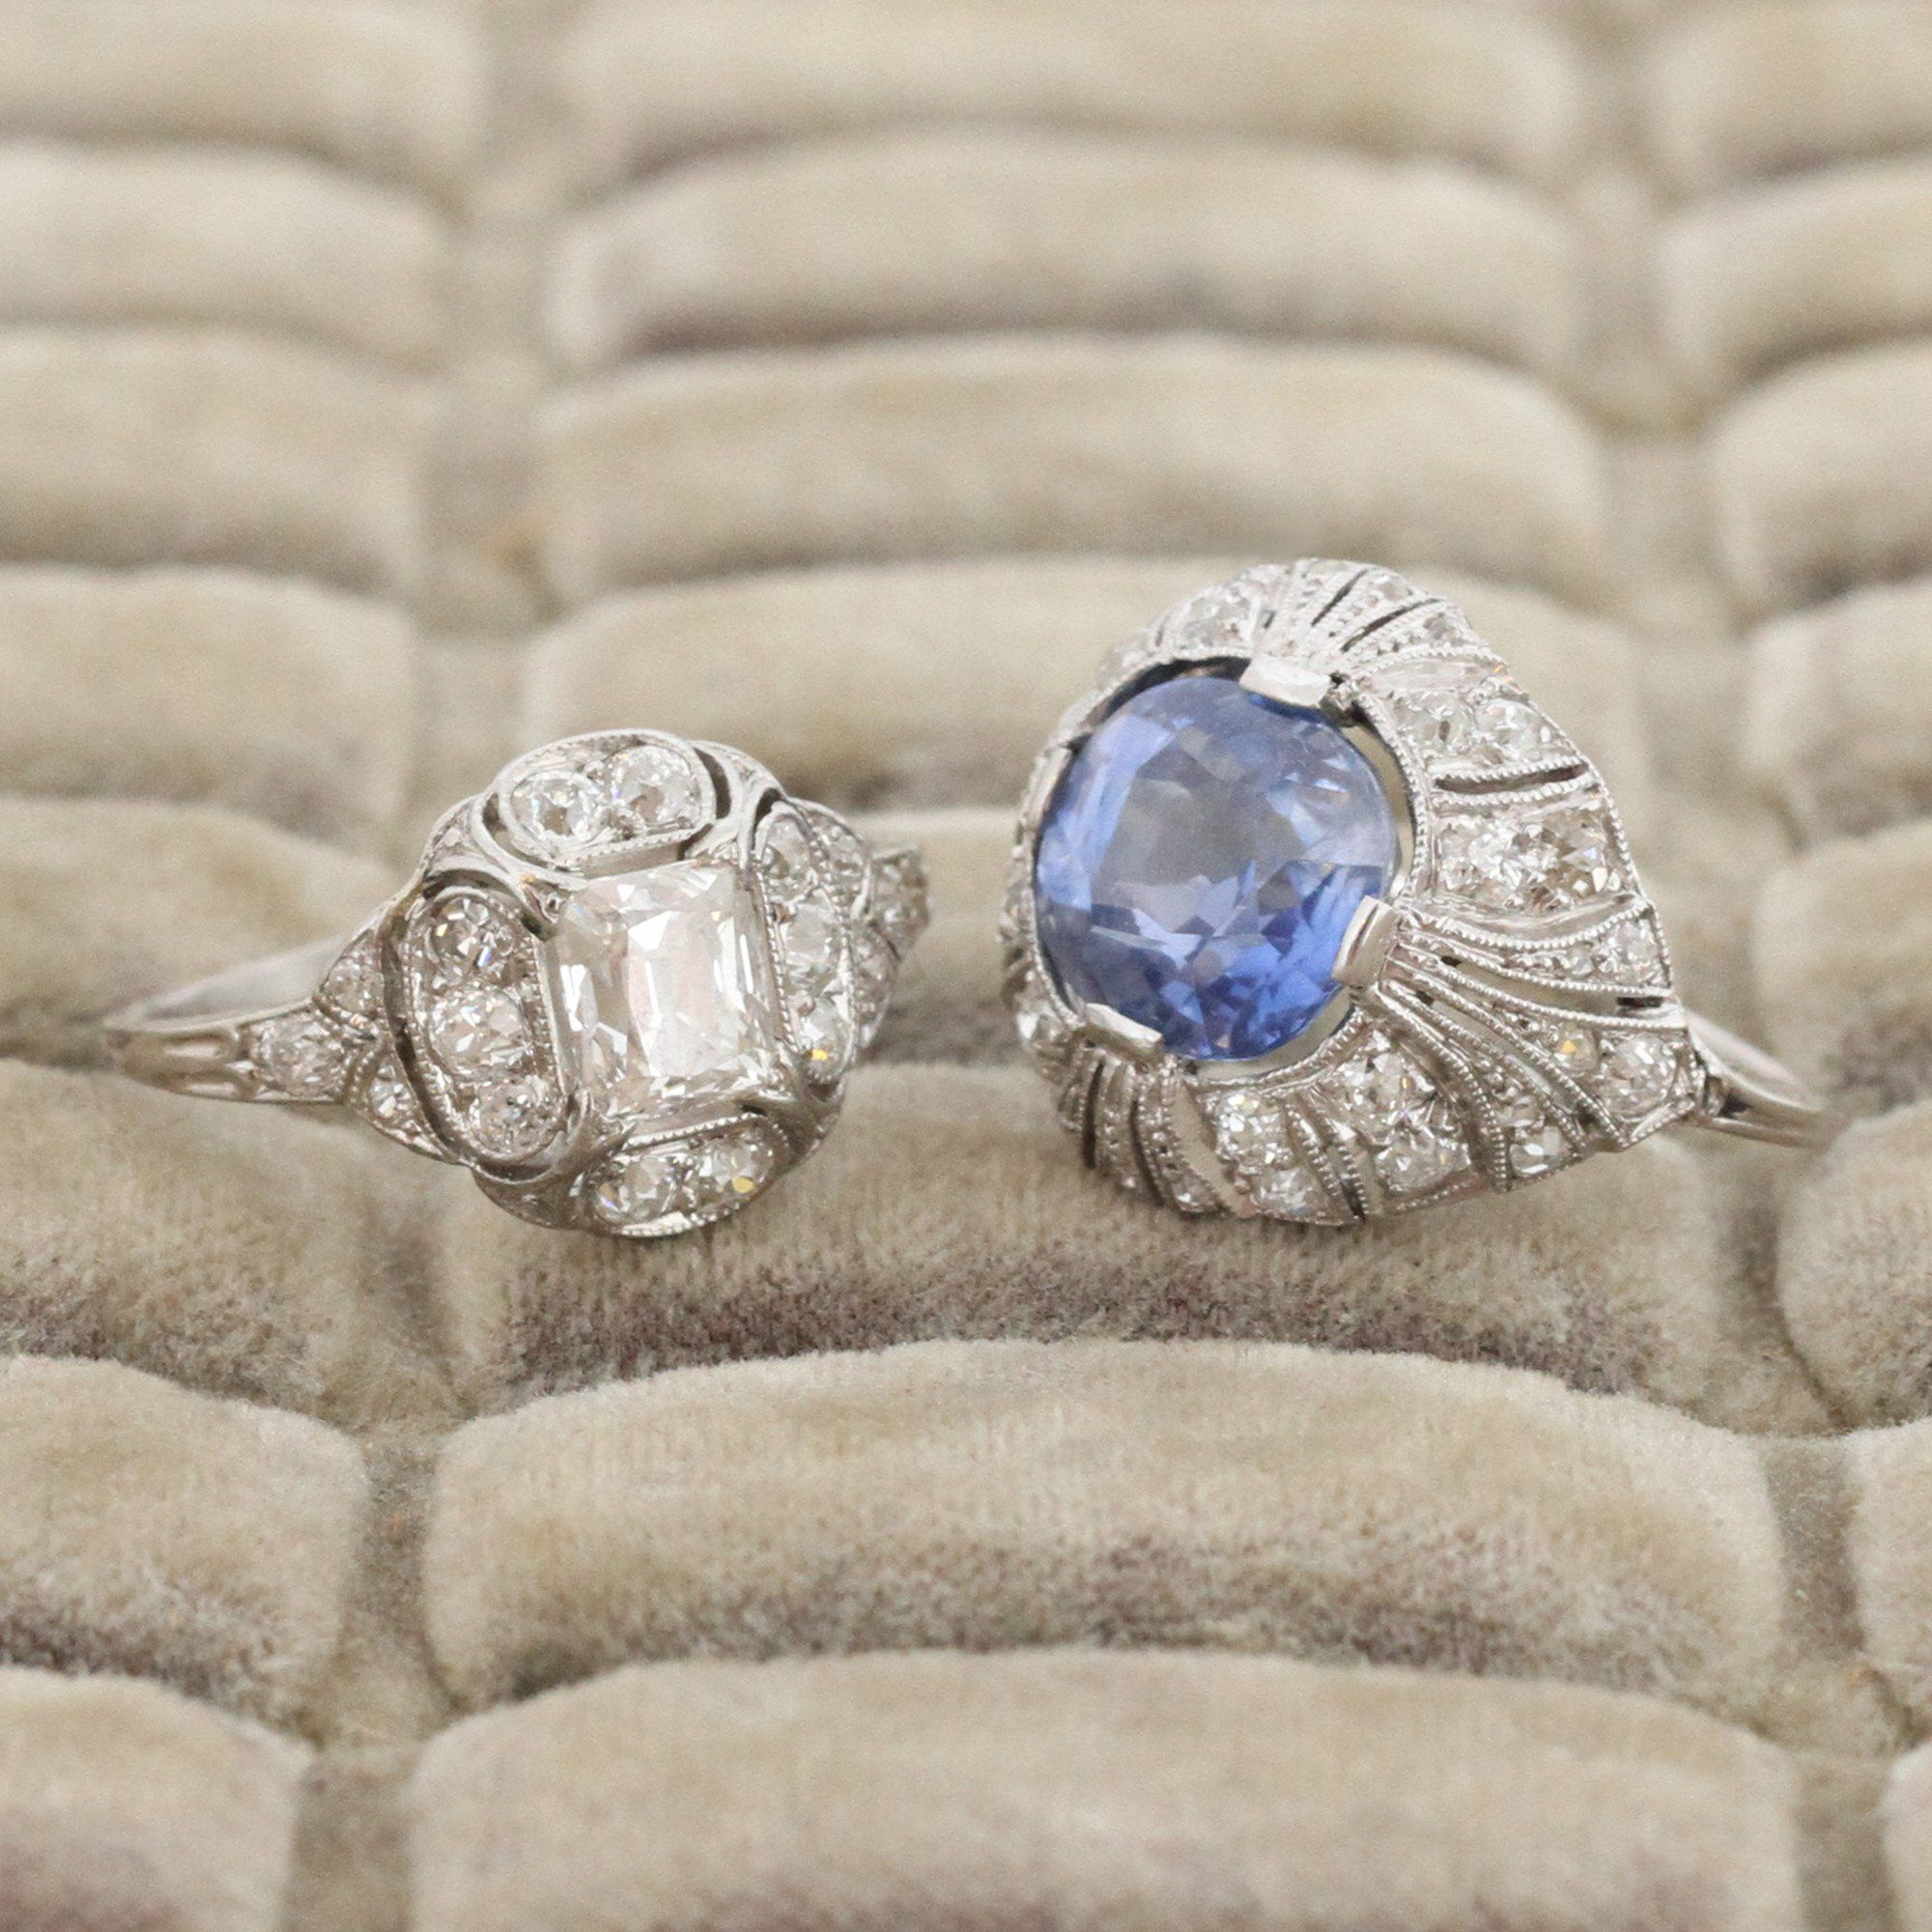 Edwardian 4.25ct Ceylon Sapphire and Diamond Ring